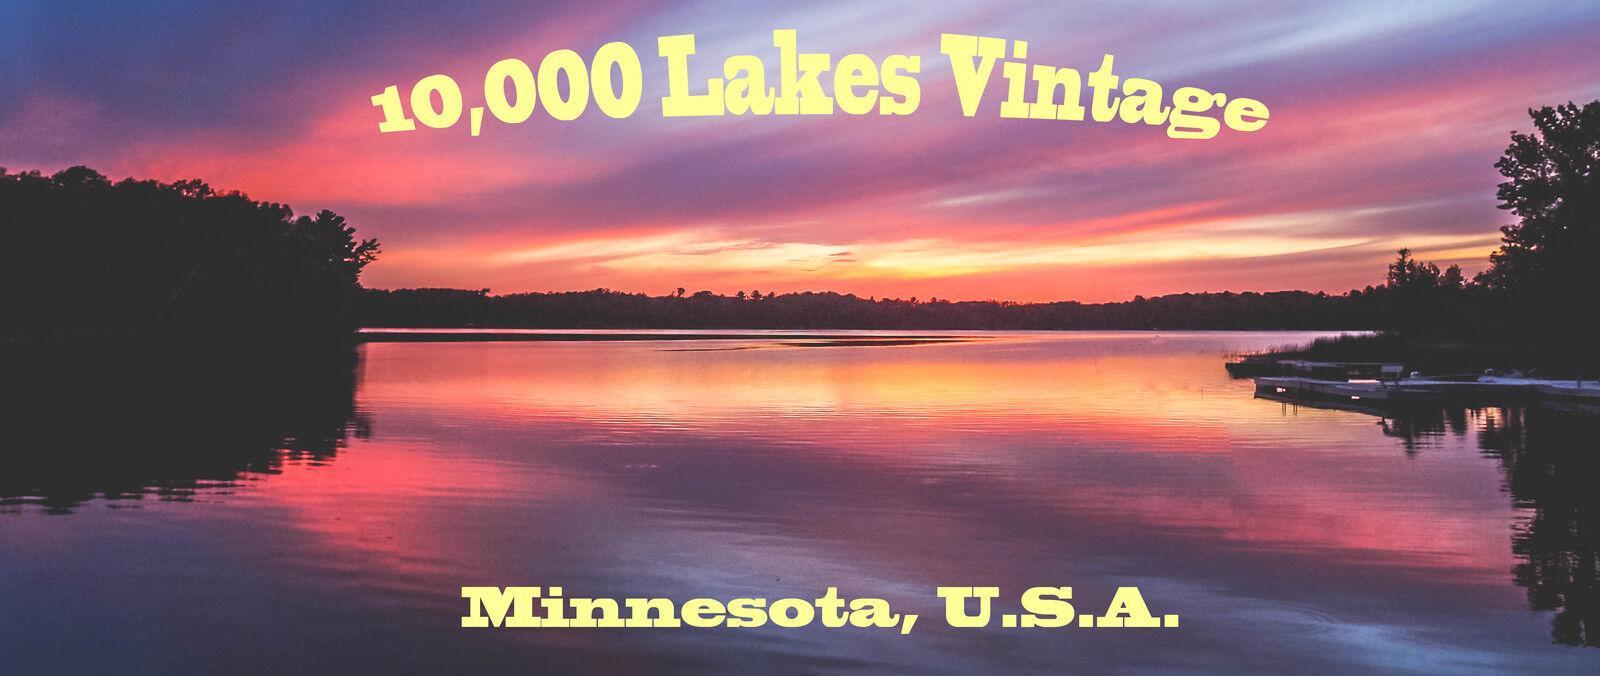 10,000 Lakes Vintage